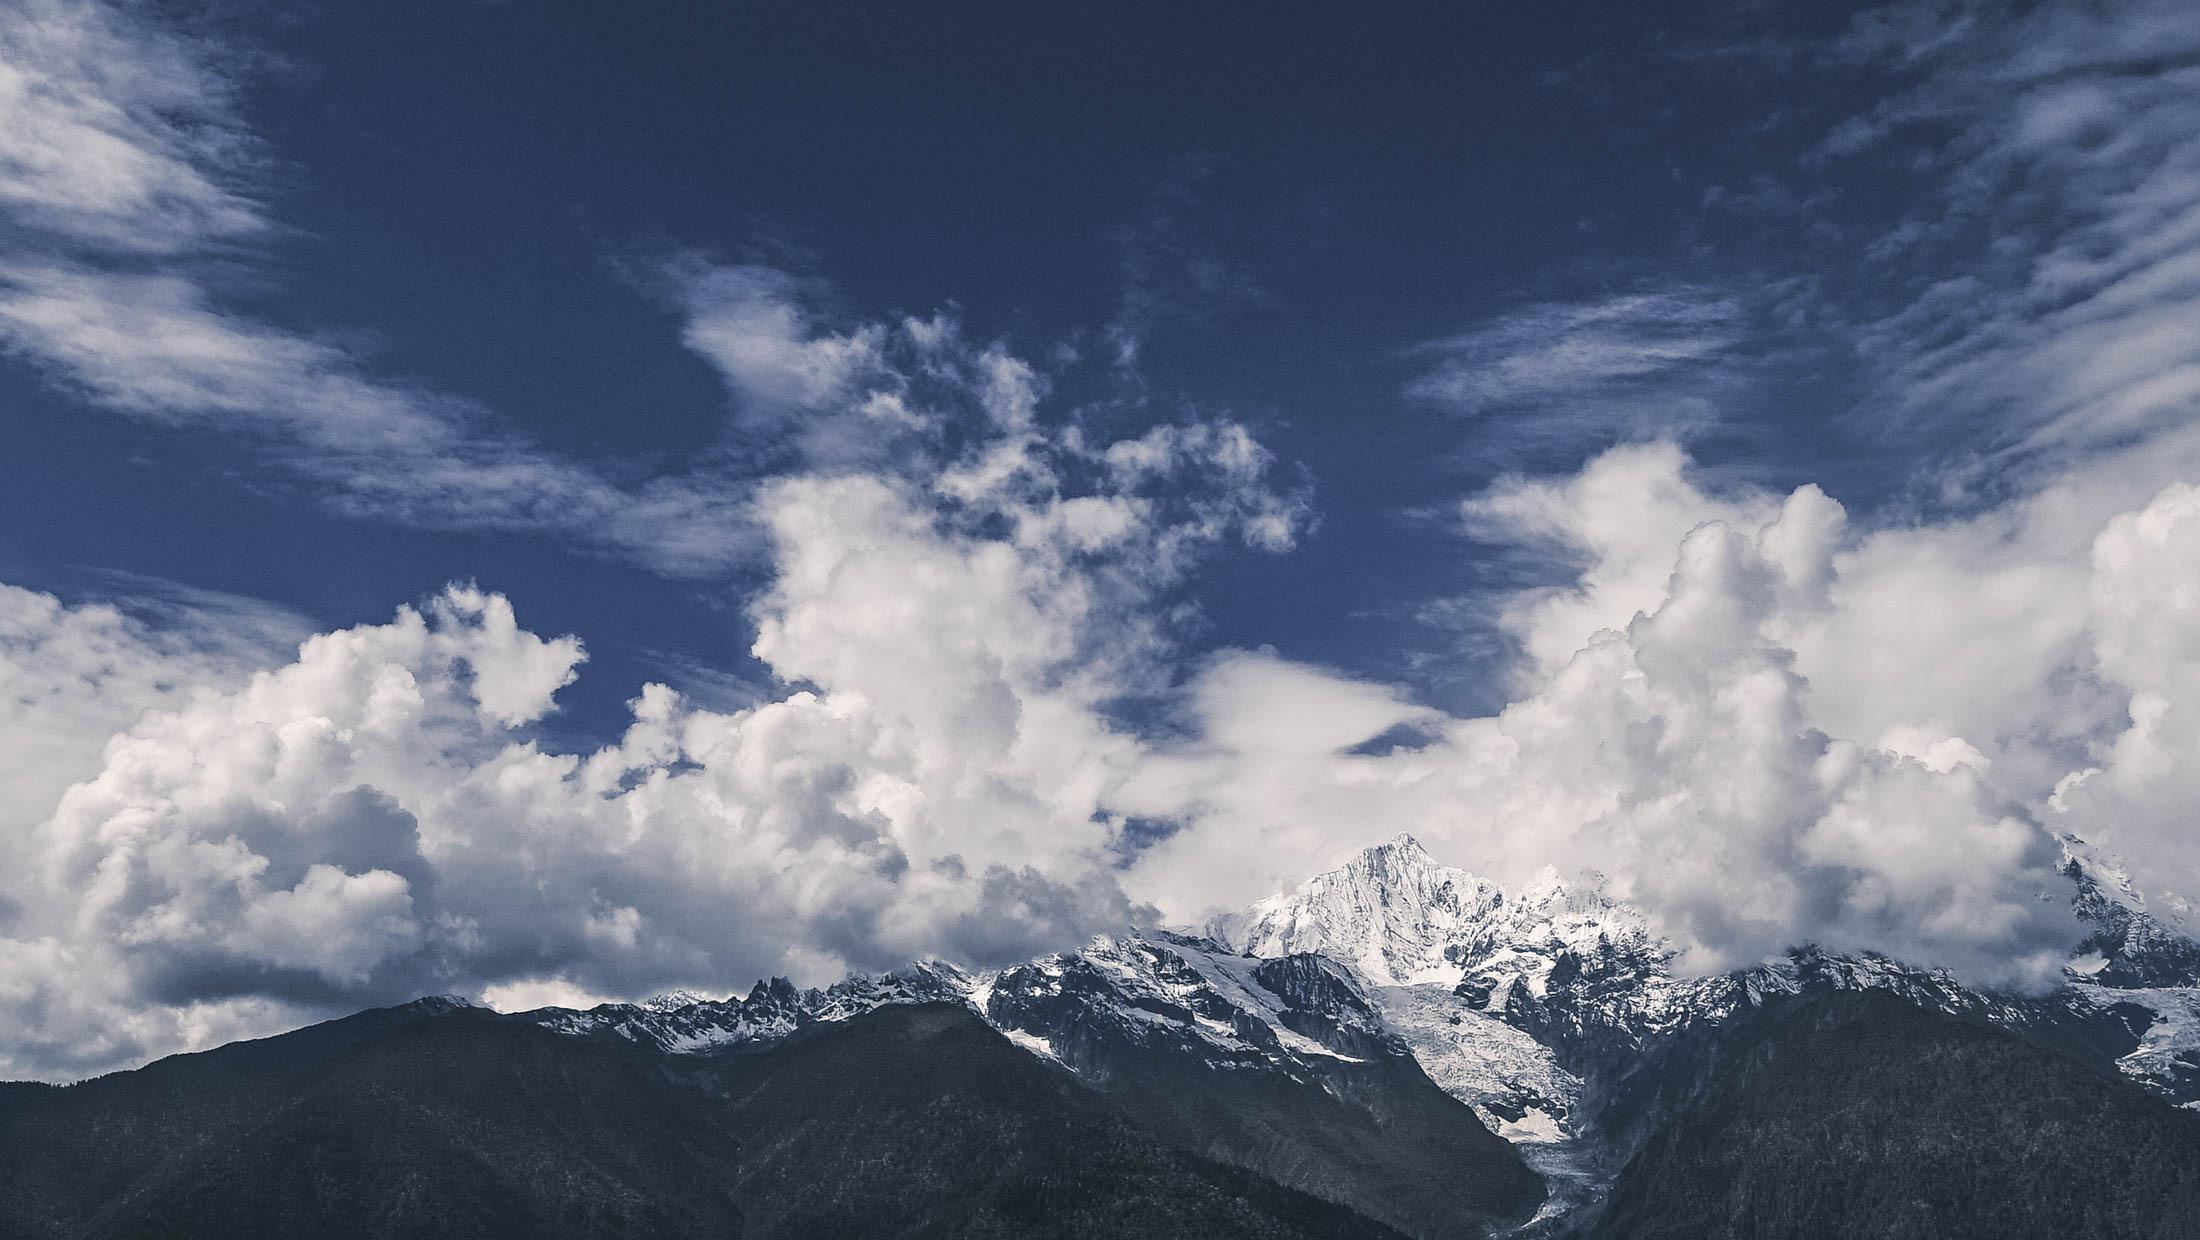 ao-yun-vineyard-mountain